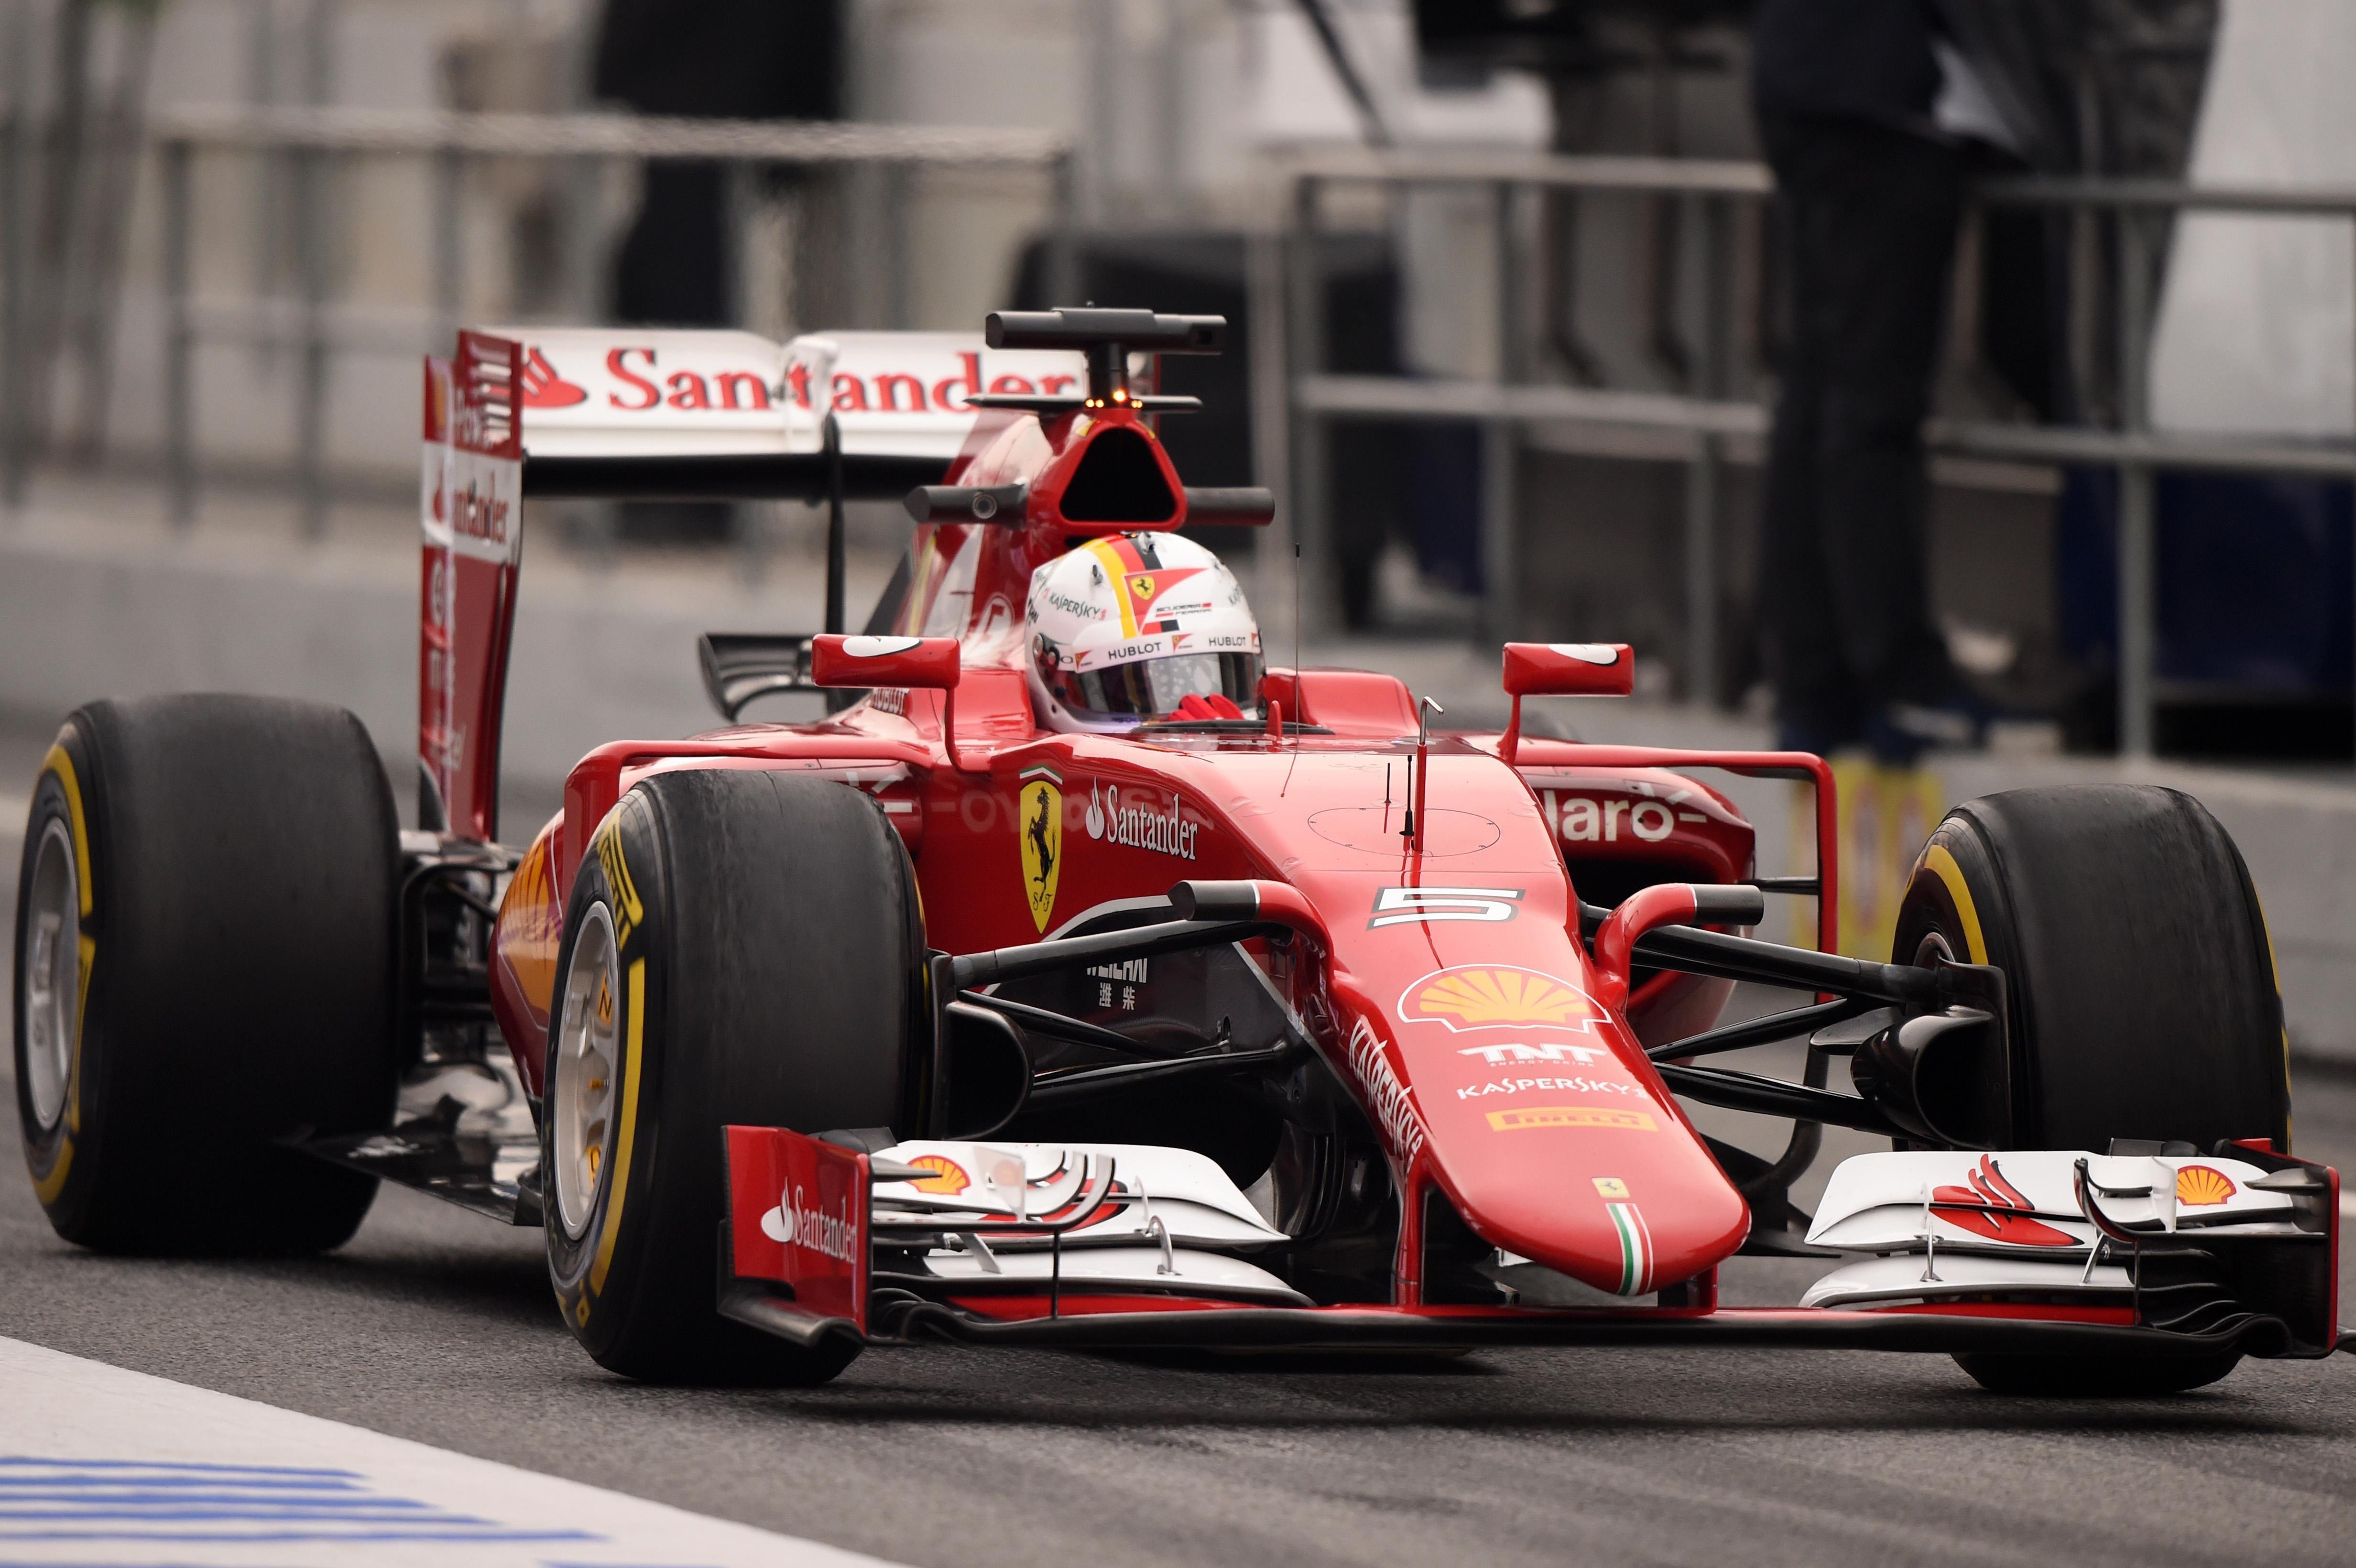 F1 News, Drivers, Results Formula 1 Live Online Sky